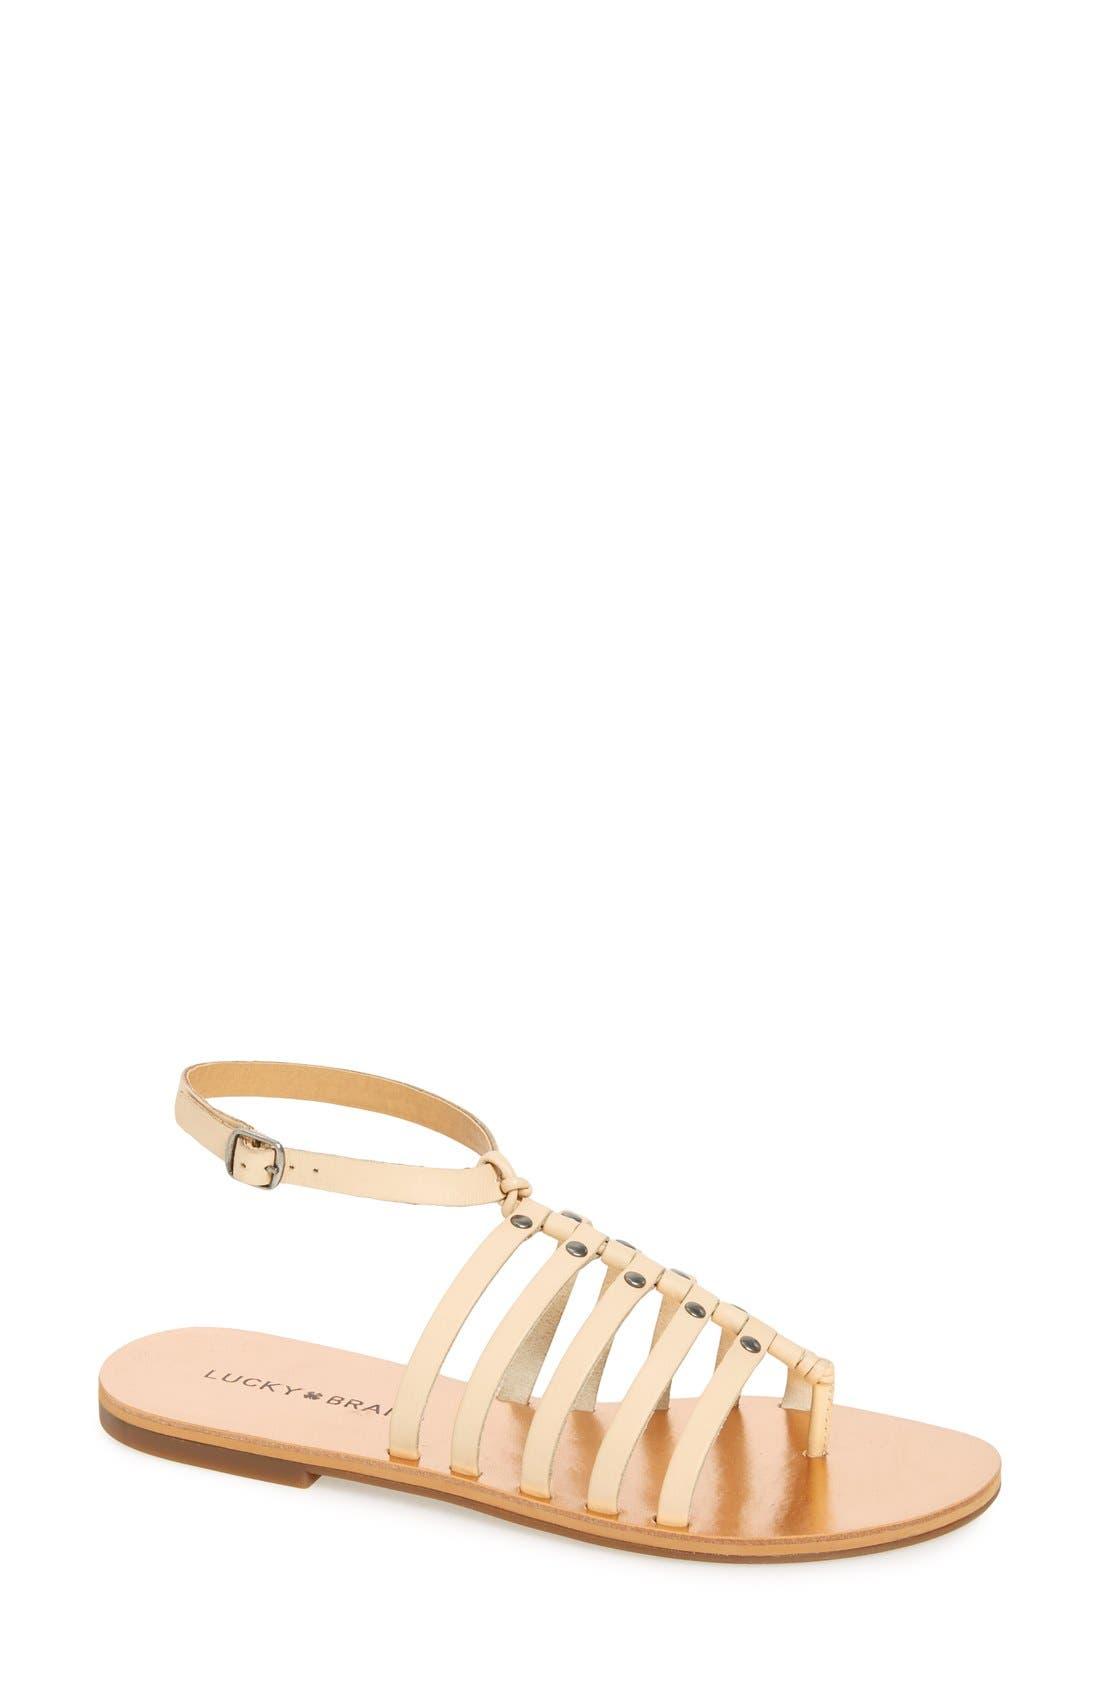 Alternate Image 1 Selected - Lucky Brand 'Cymaa' Gladiator Sandal (Women)